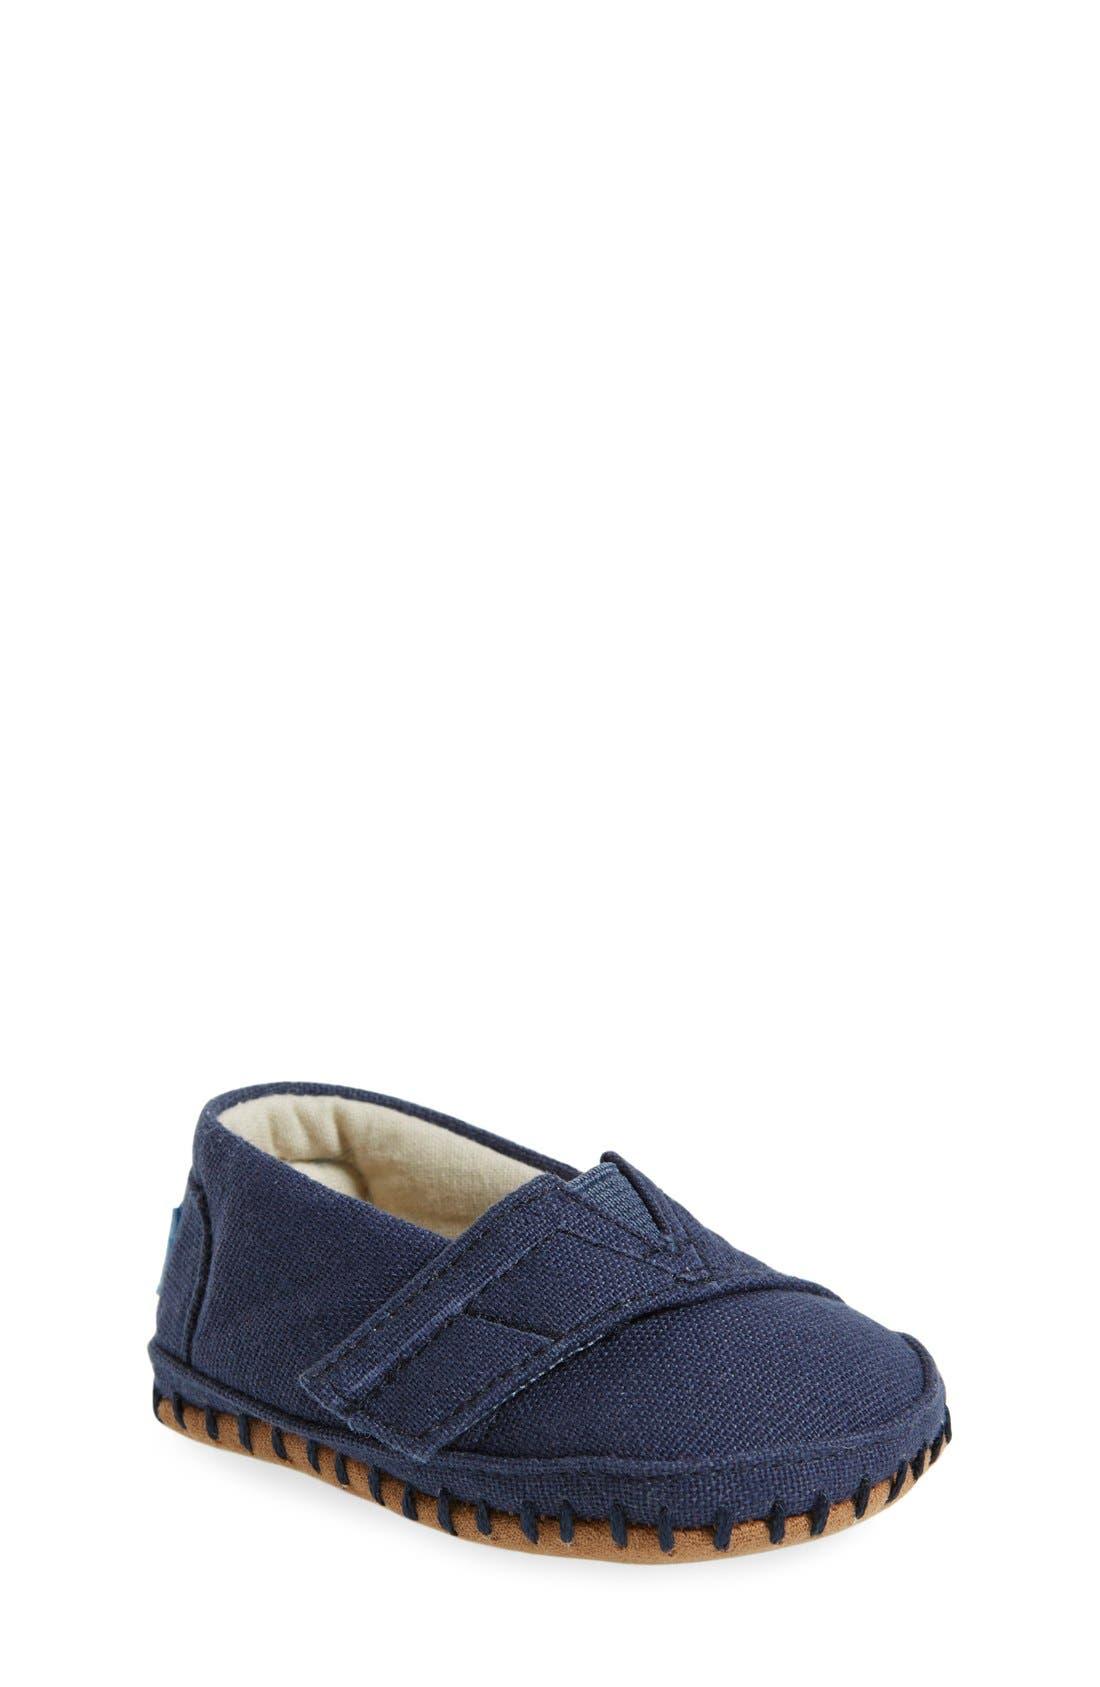 TOMS Alpargata Crib Shoe (Baby)